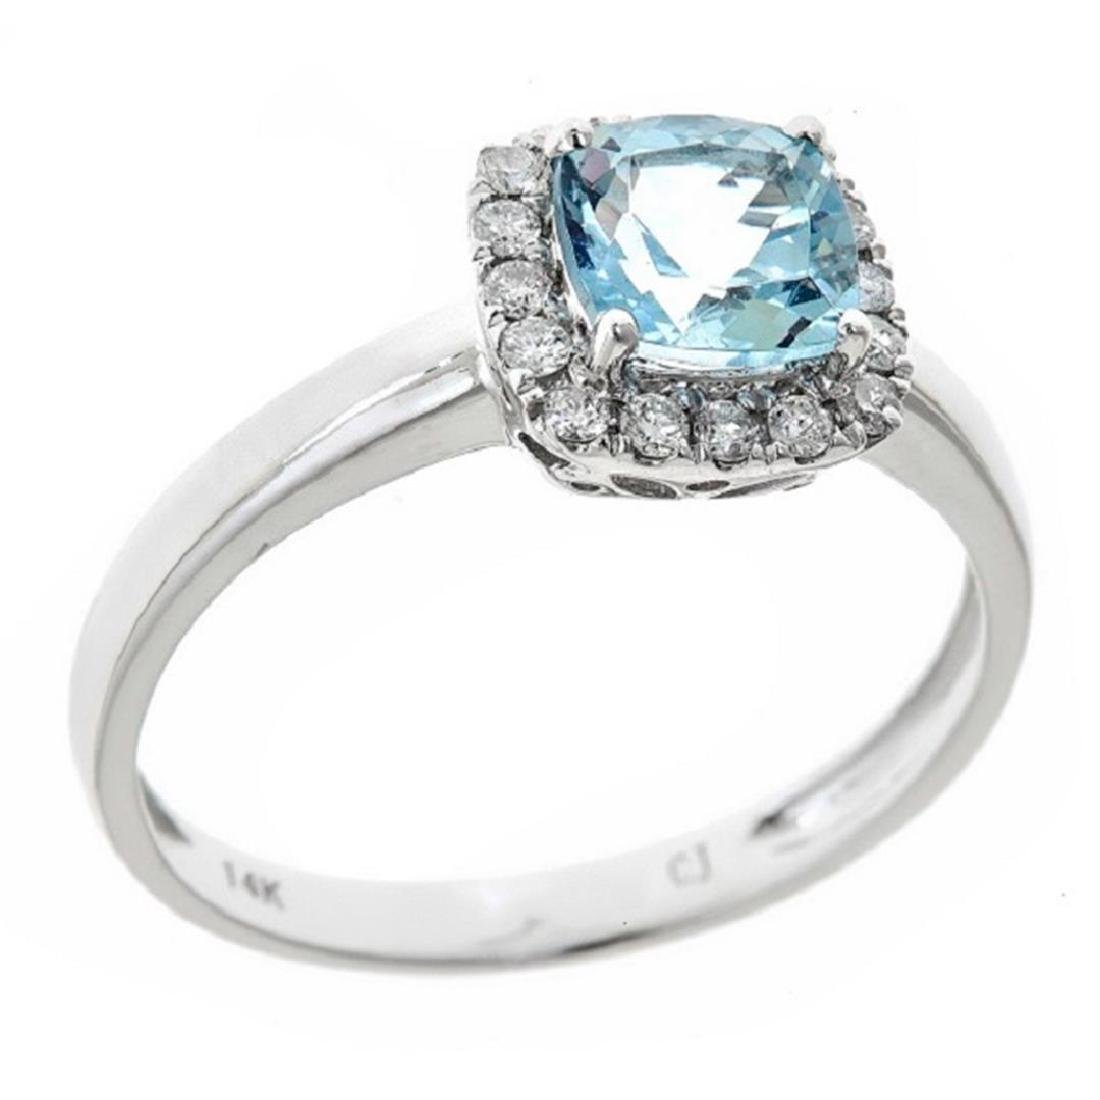 0.76 ctw Aquamarine and Diamond Ring - 14KT White Gold - 2